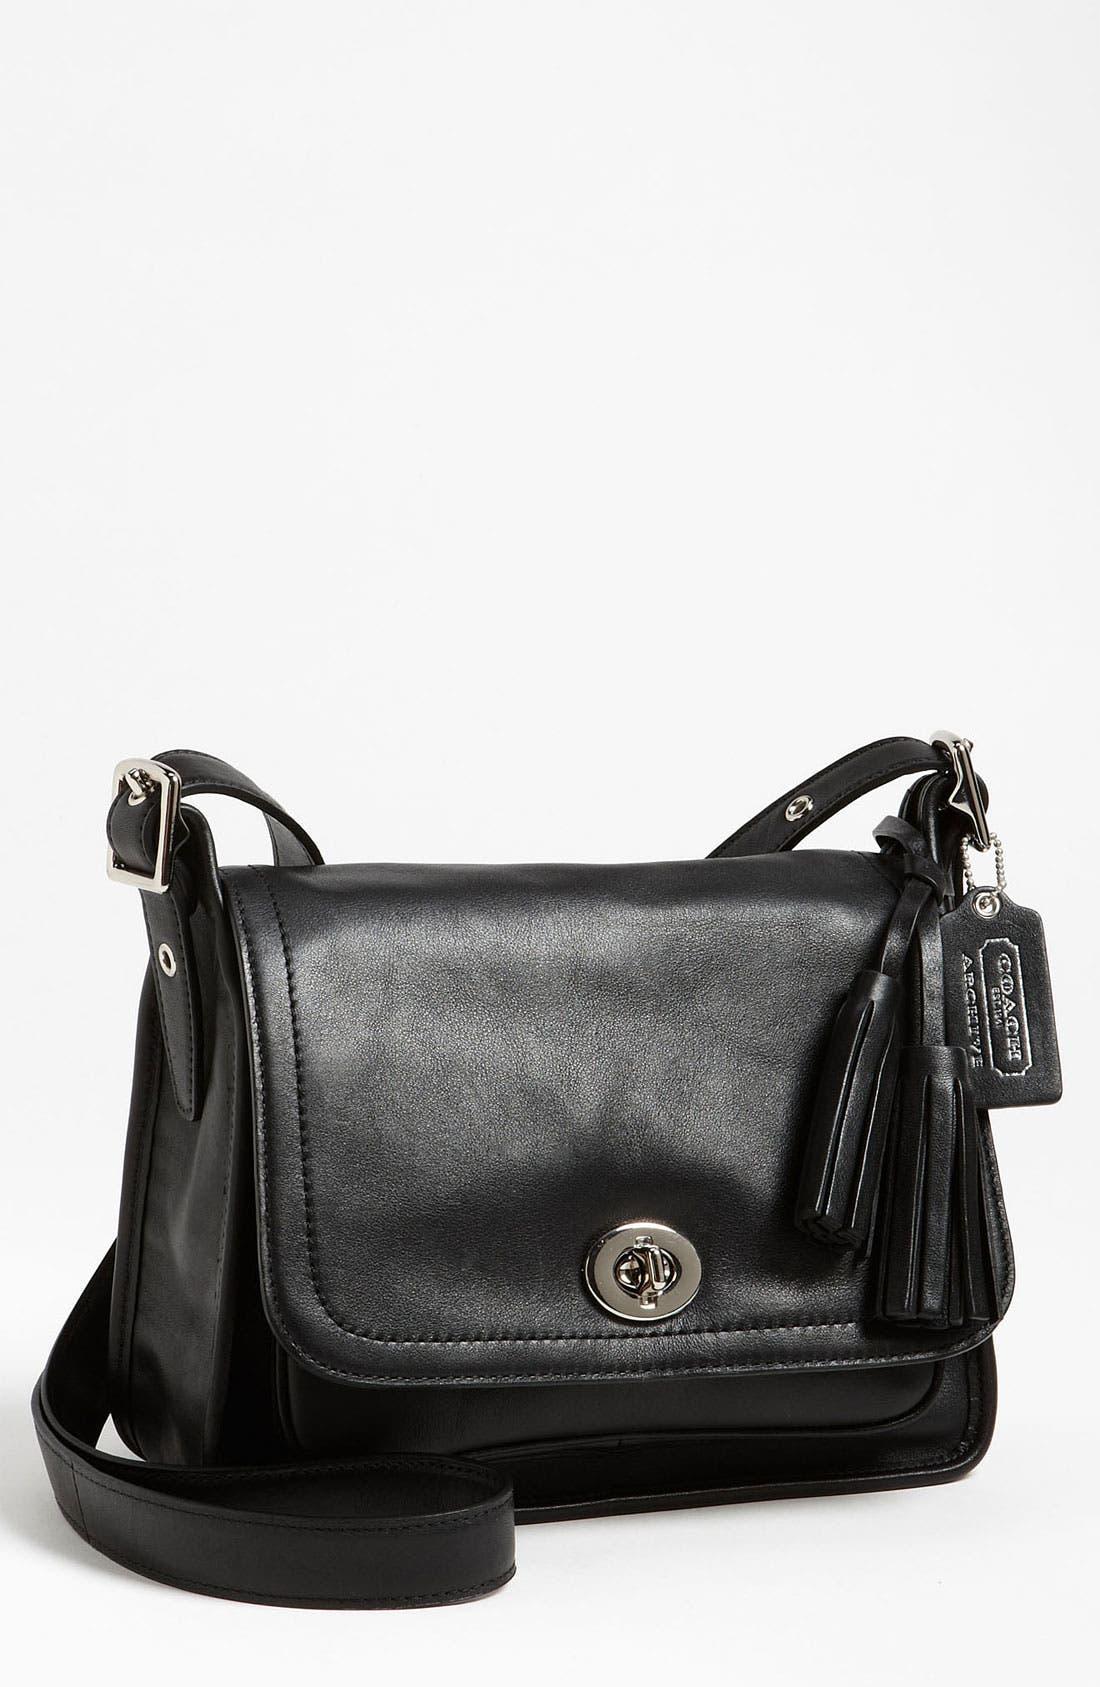 Main Image - COACH 'Legacy Archival - Rambler' Crossbody Bag